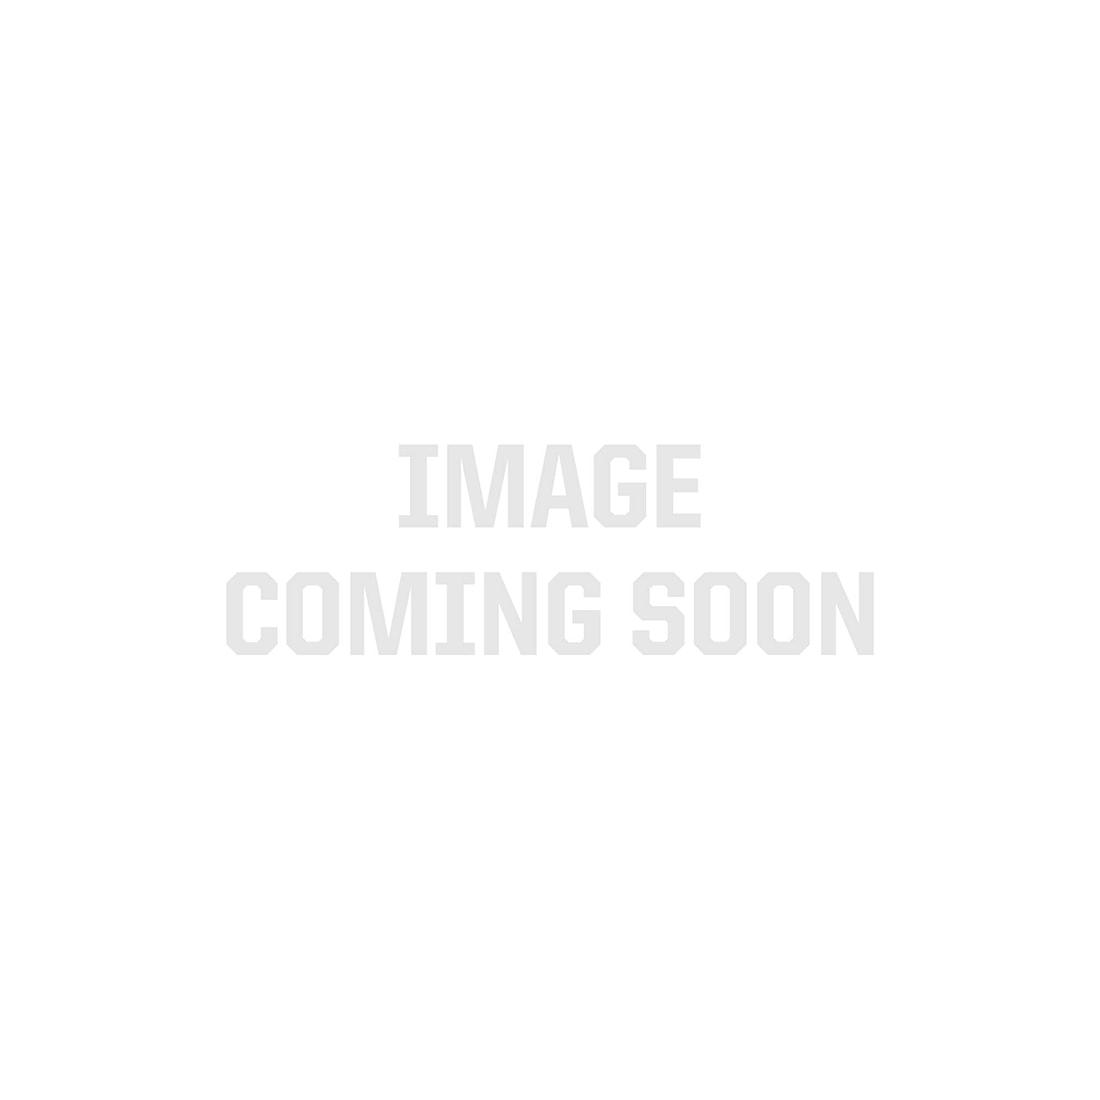 Kichler Design Pro LED Mini Deck Light (Textured Black Finish, Aluminum Housing)